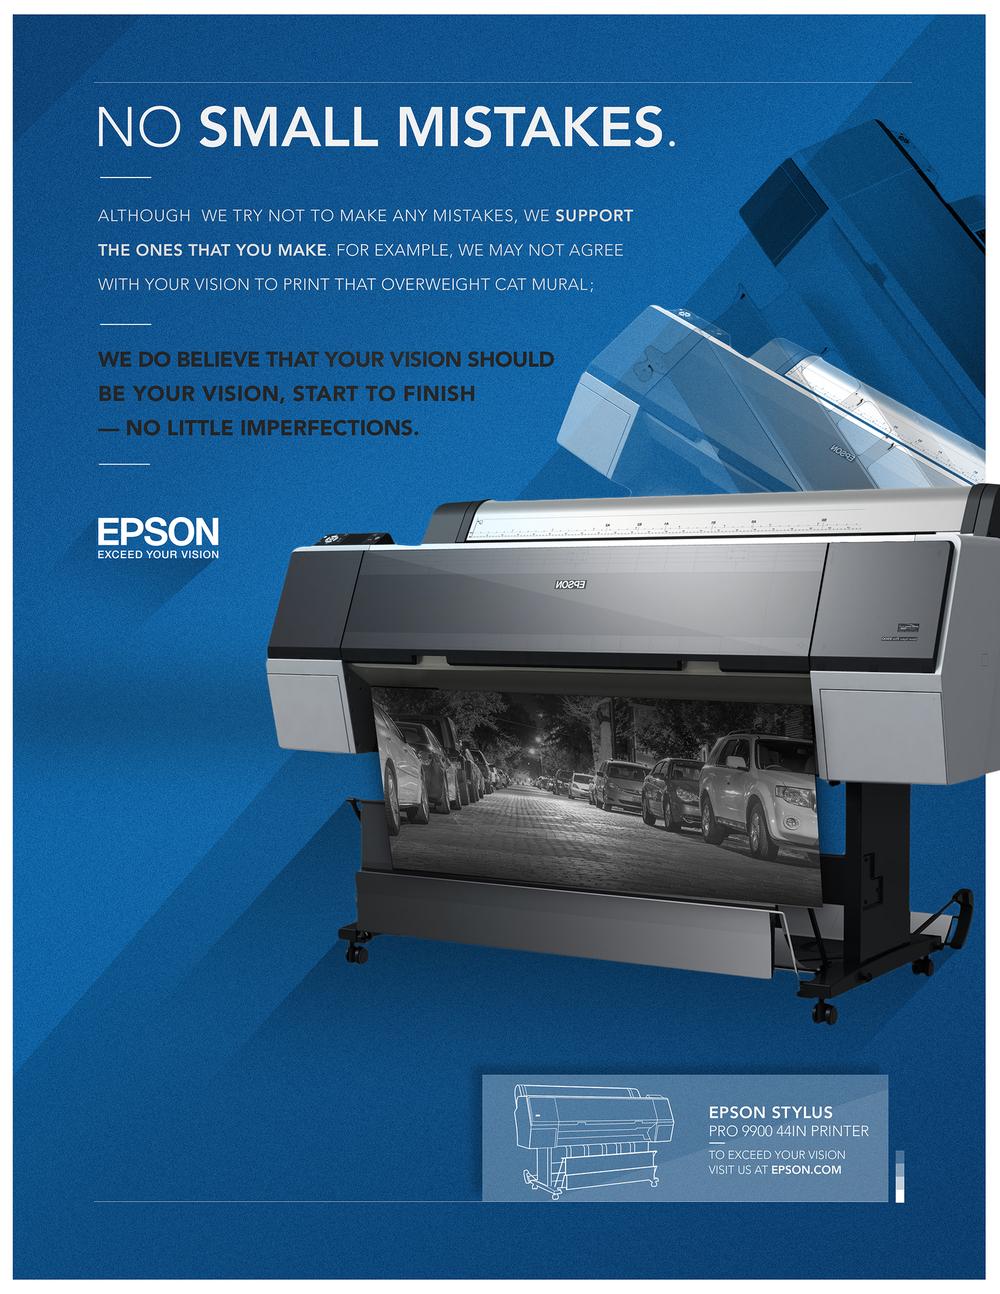 epson print ads 1.jpg